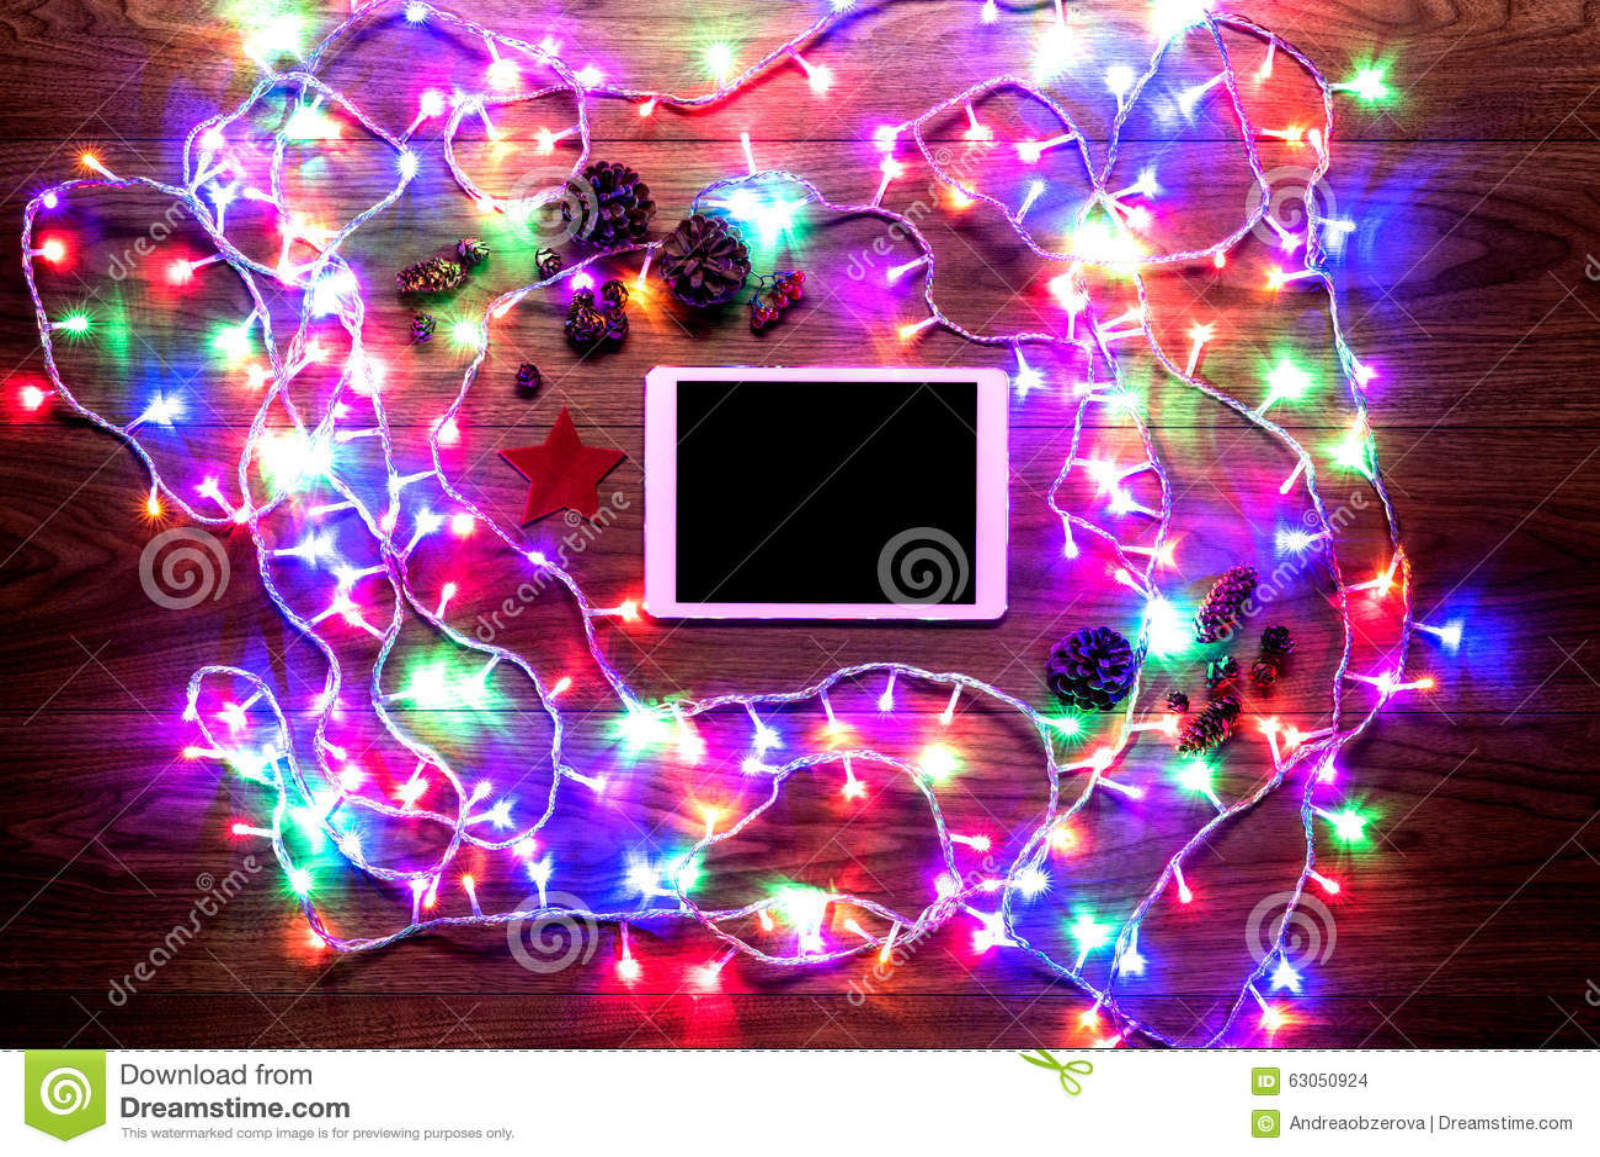 Light online shop